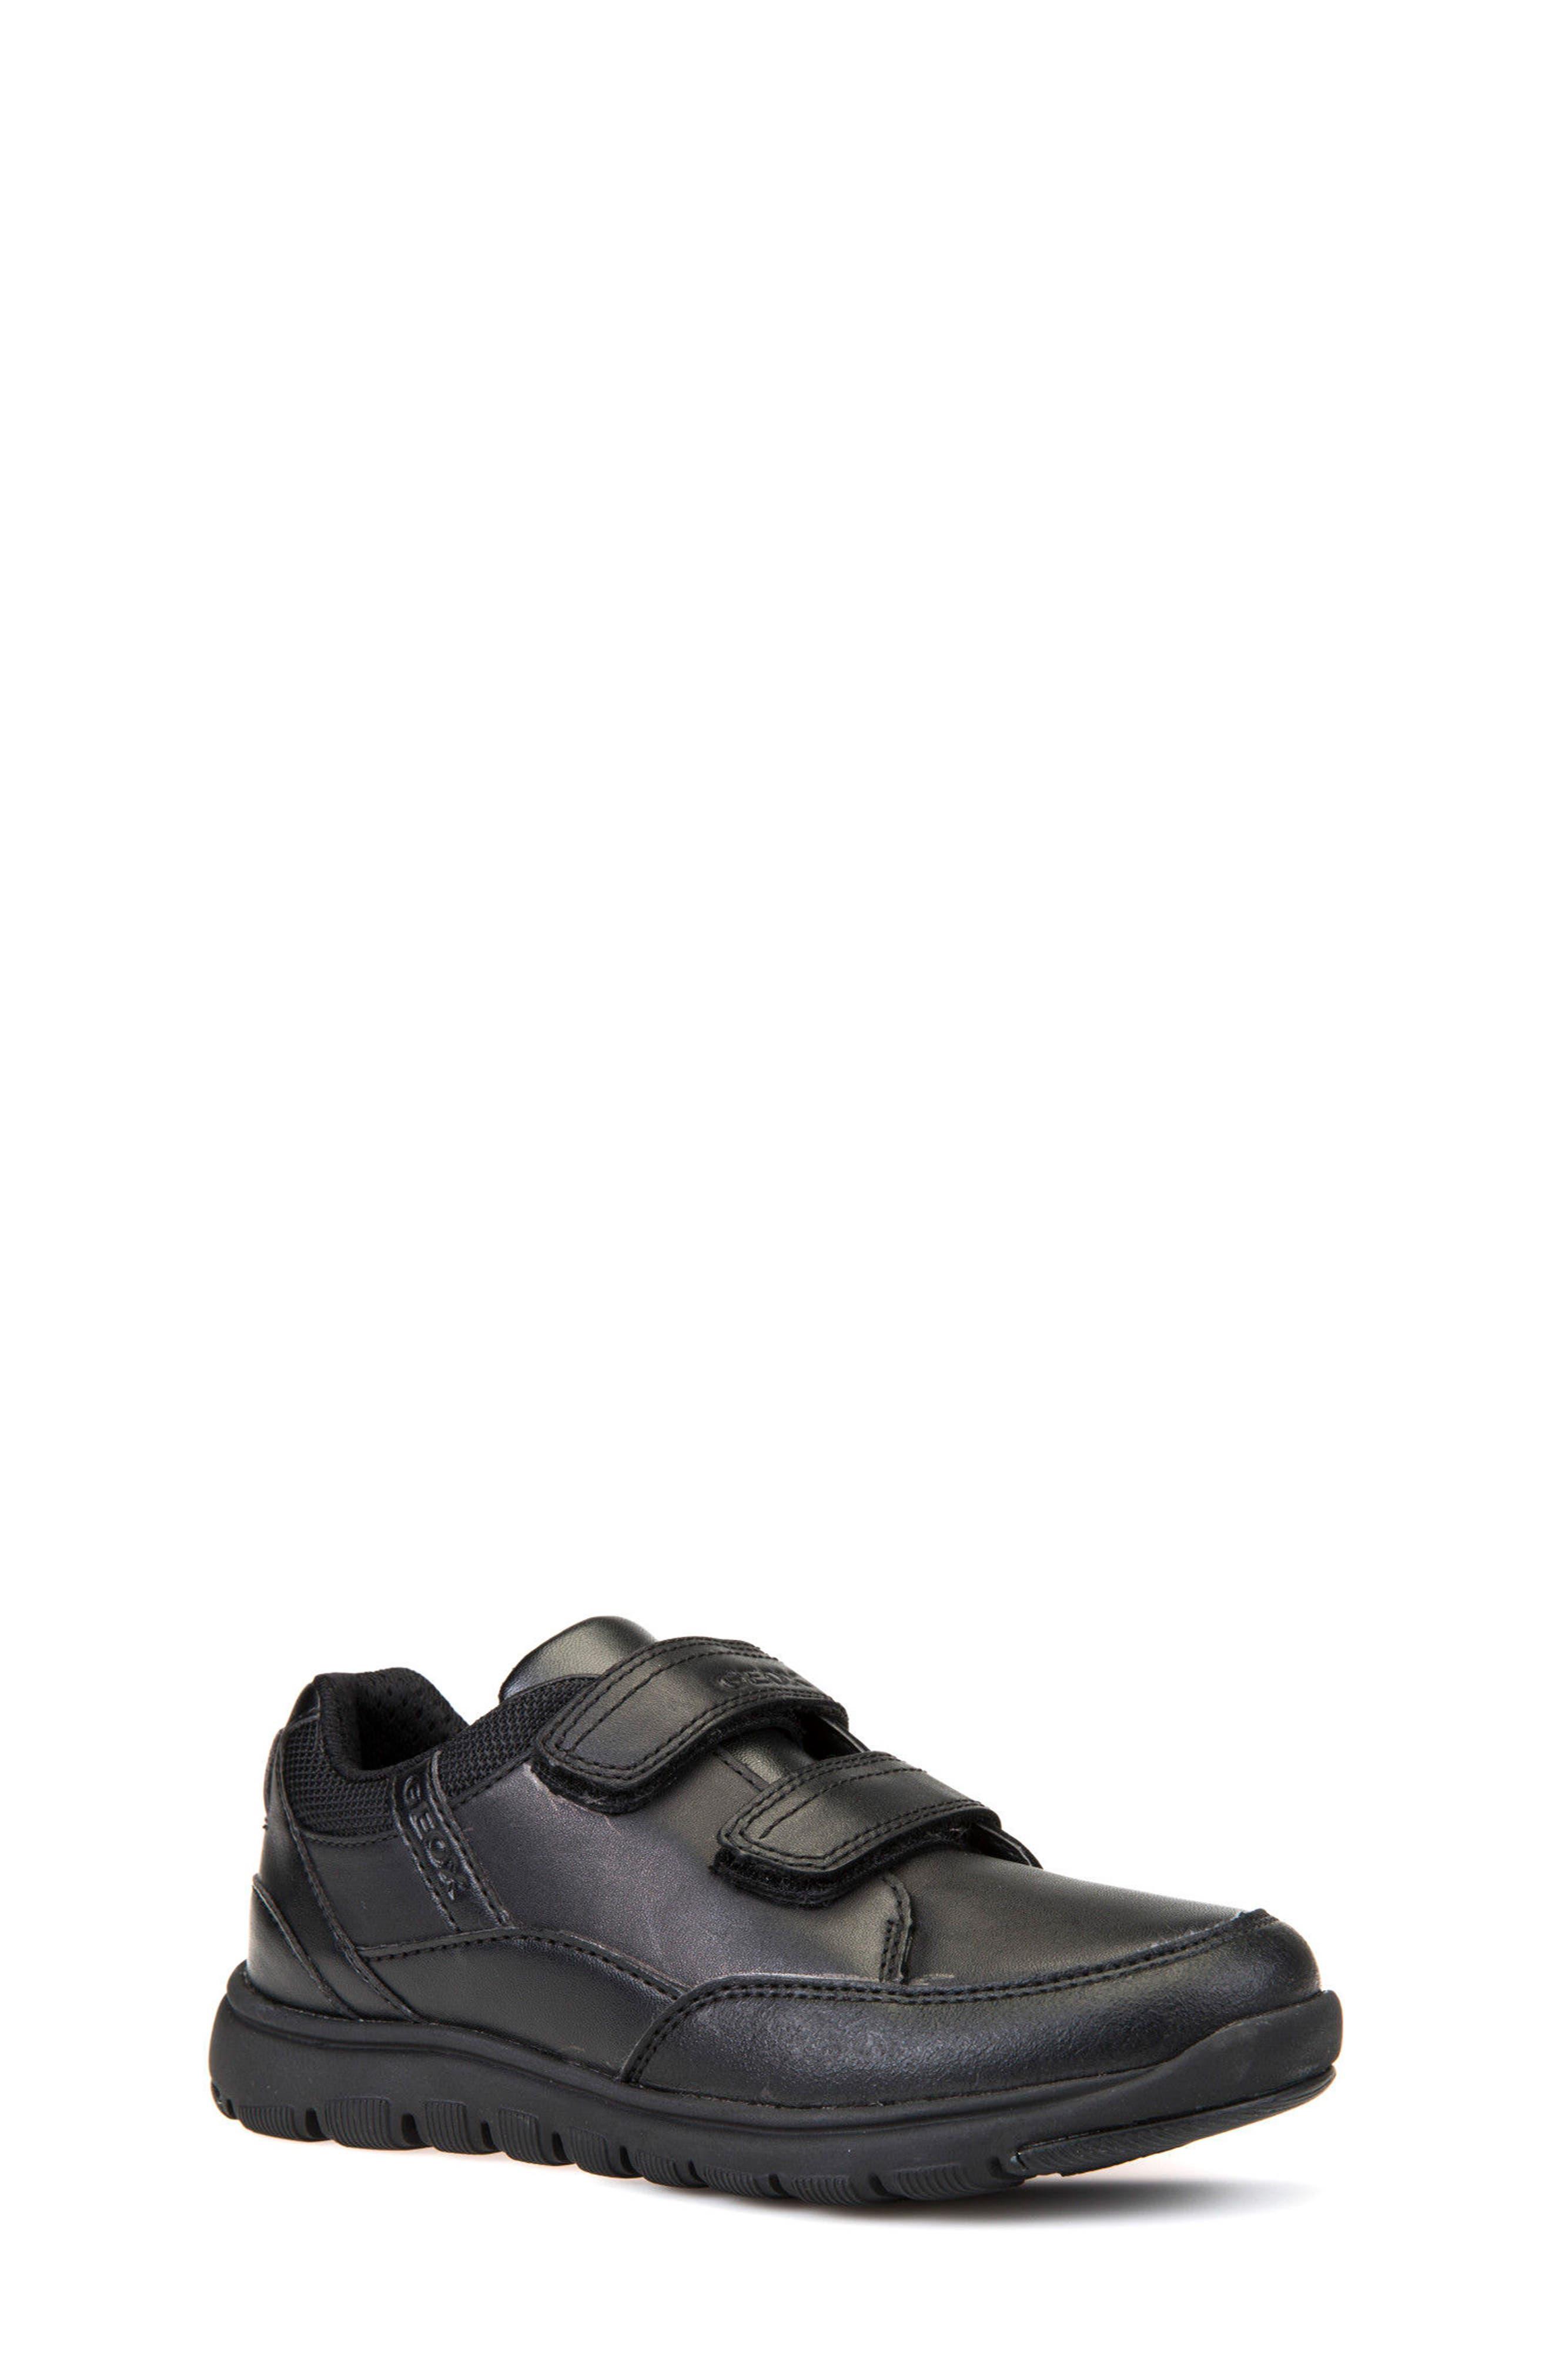 Xunday Low Top Sneaker,                         Main,                         color, BLACK